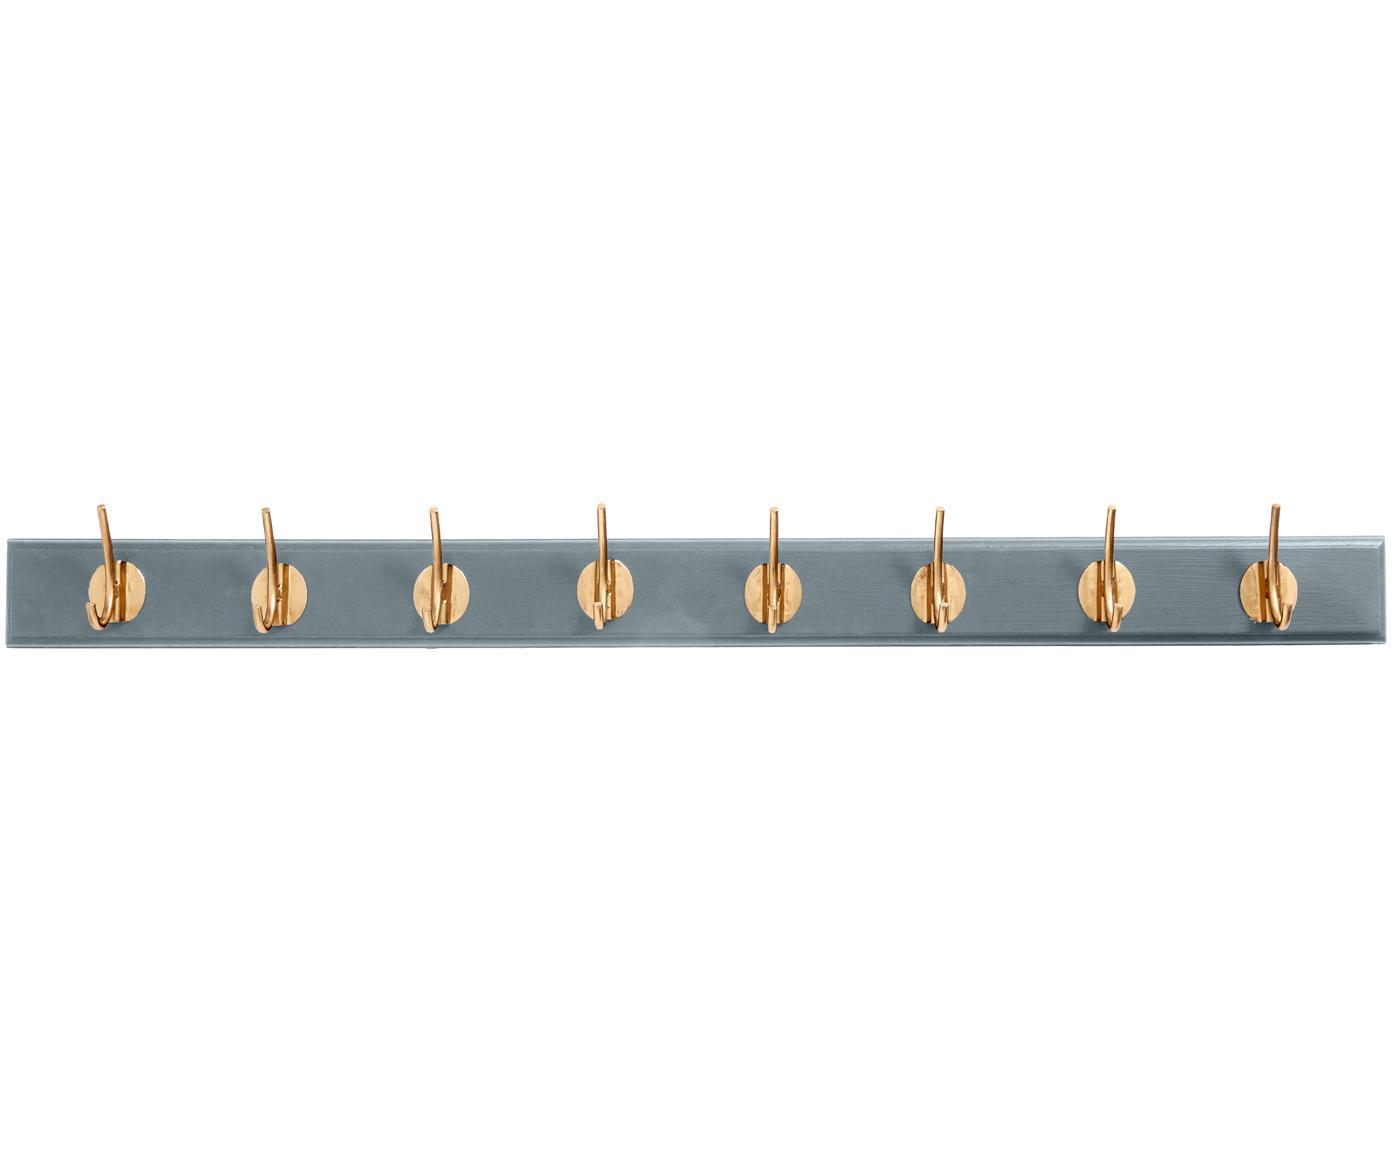 XL jassenhaak Aoife met metalen haak, Lijst: gelakt MDF, Grijs, 90 x 7 cm